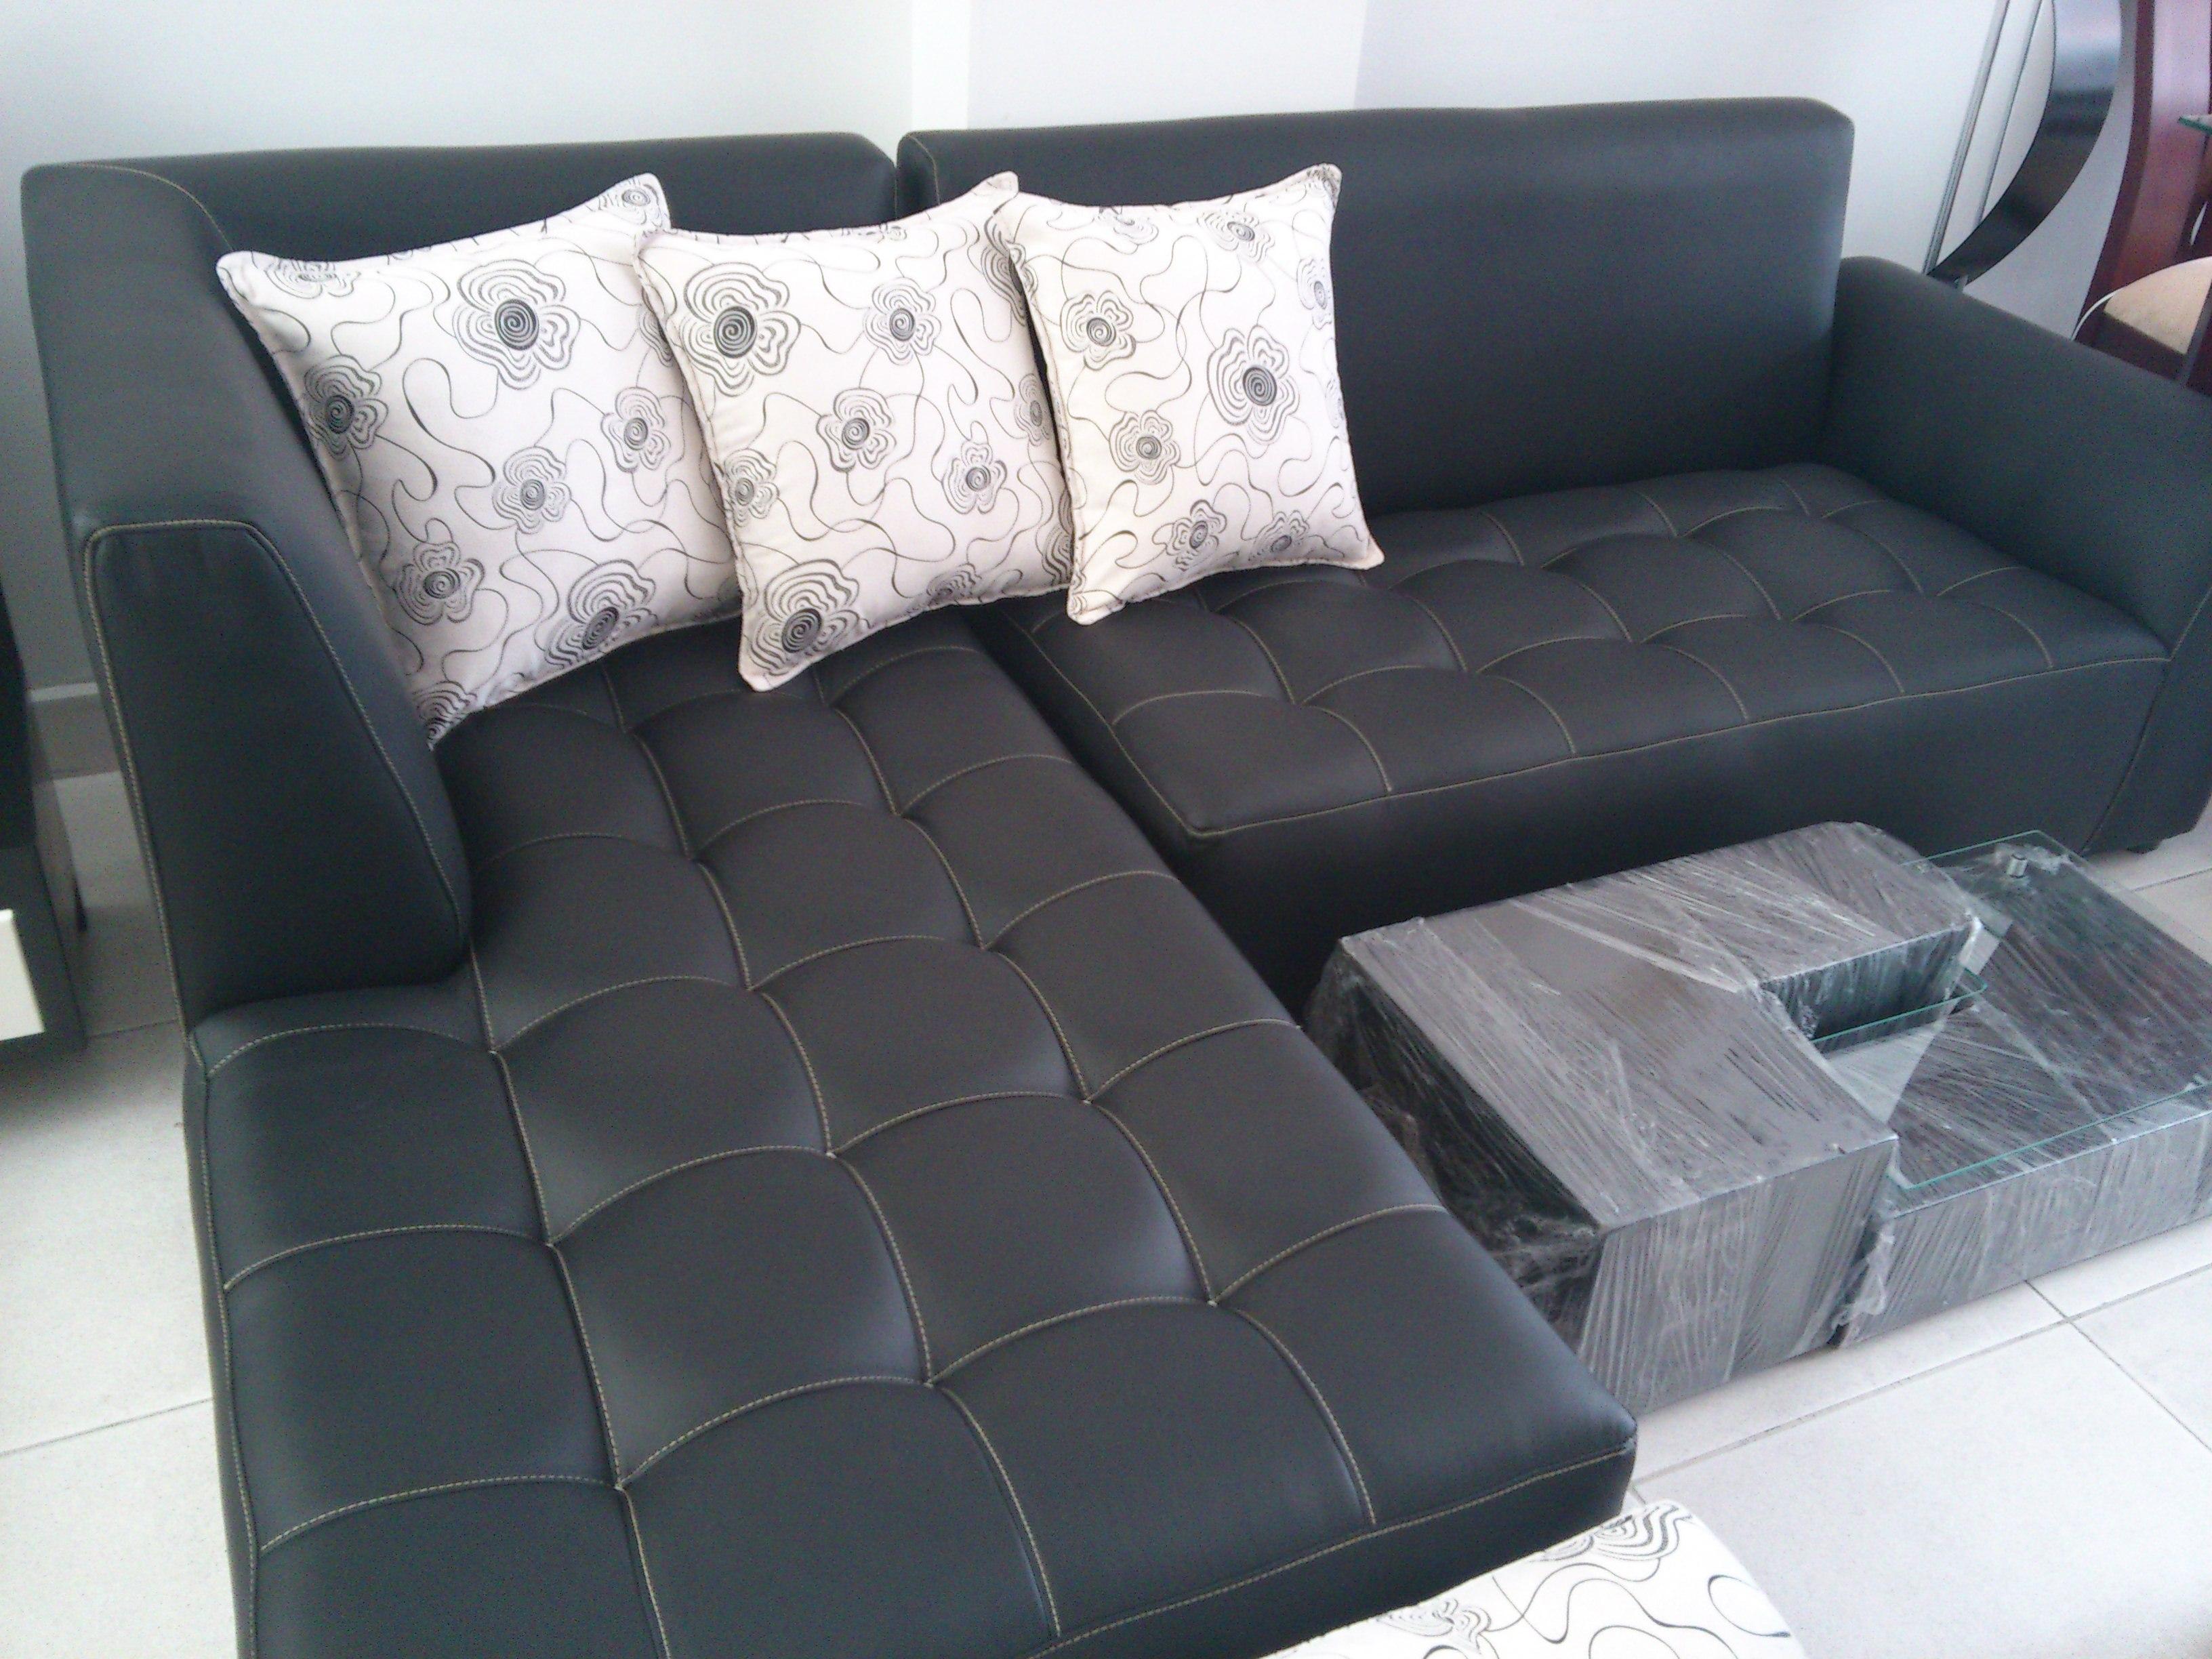 Venta muebles hogar deko economicos calidad fabric for Salas modernas precios